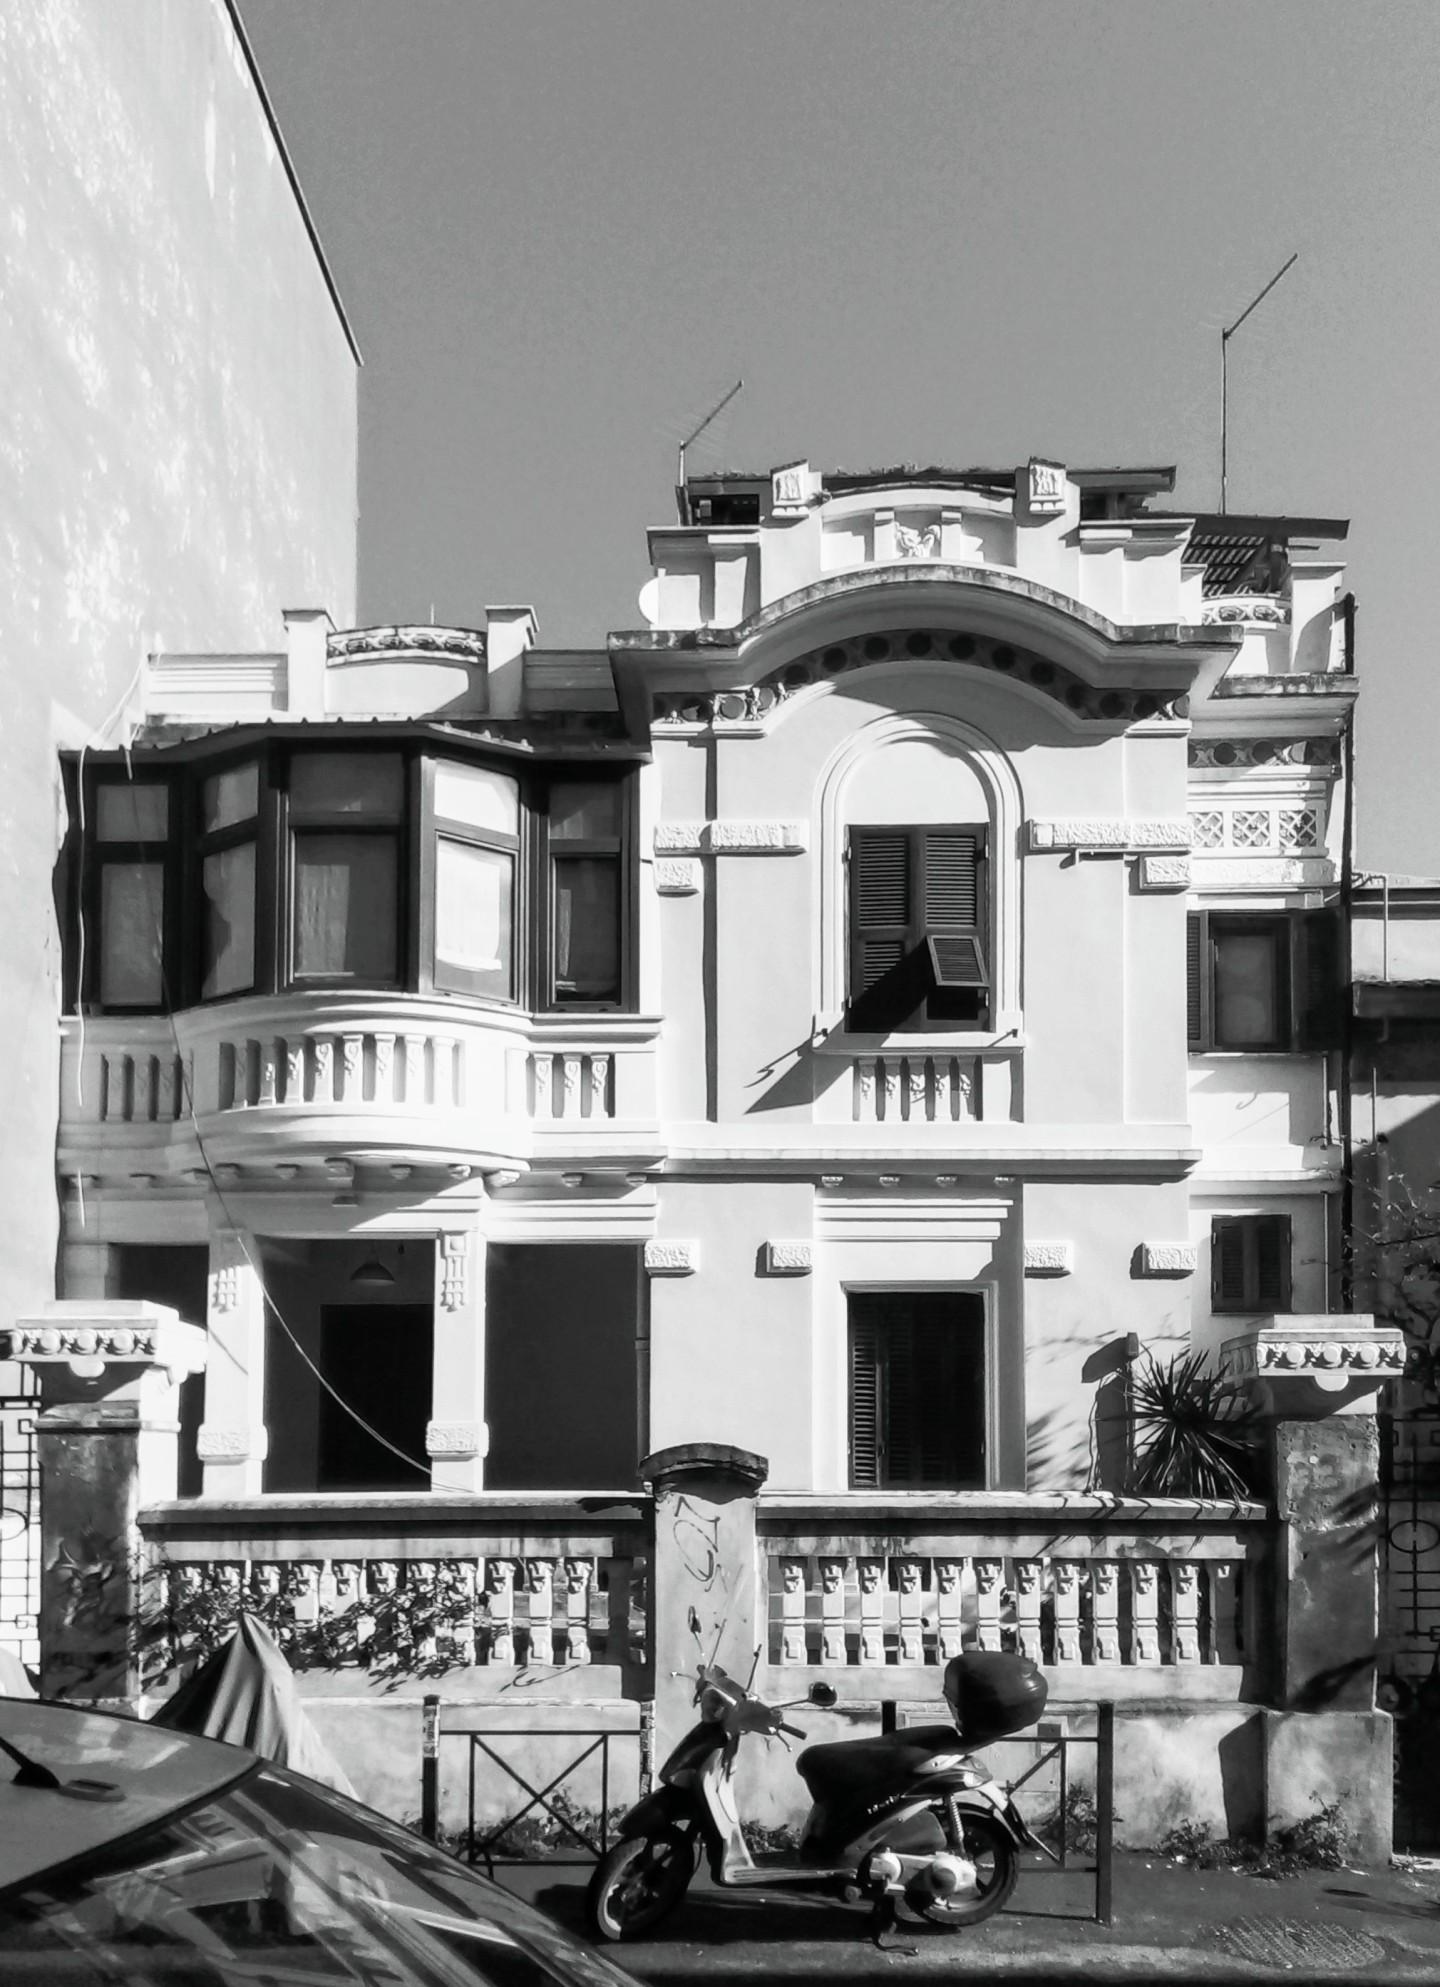 Pigneto Rome Via Braccio Da Montone building Street View facade